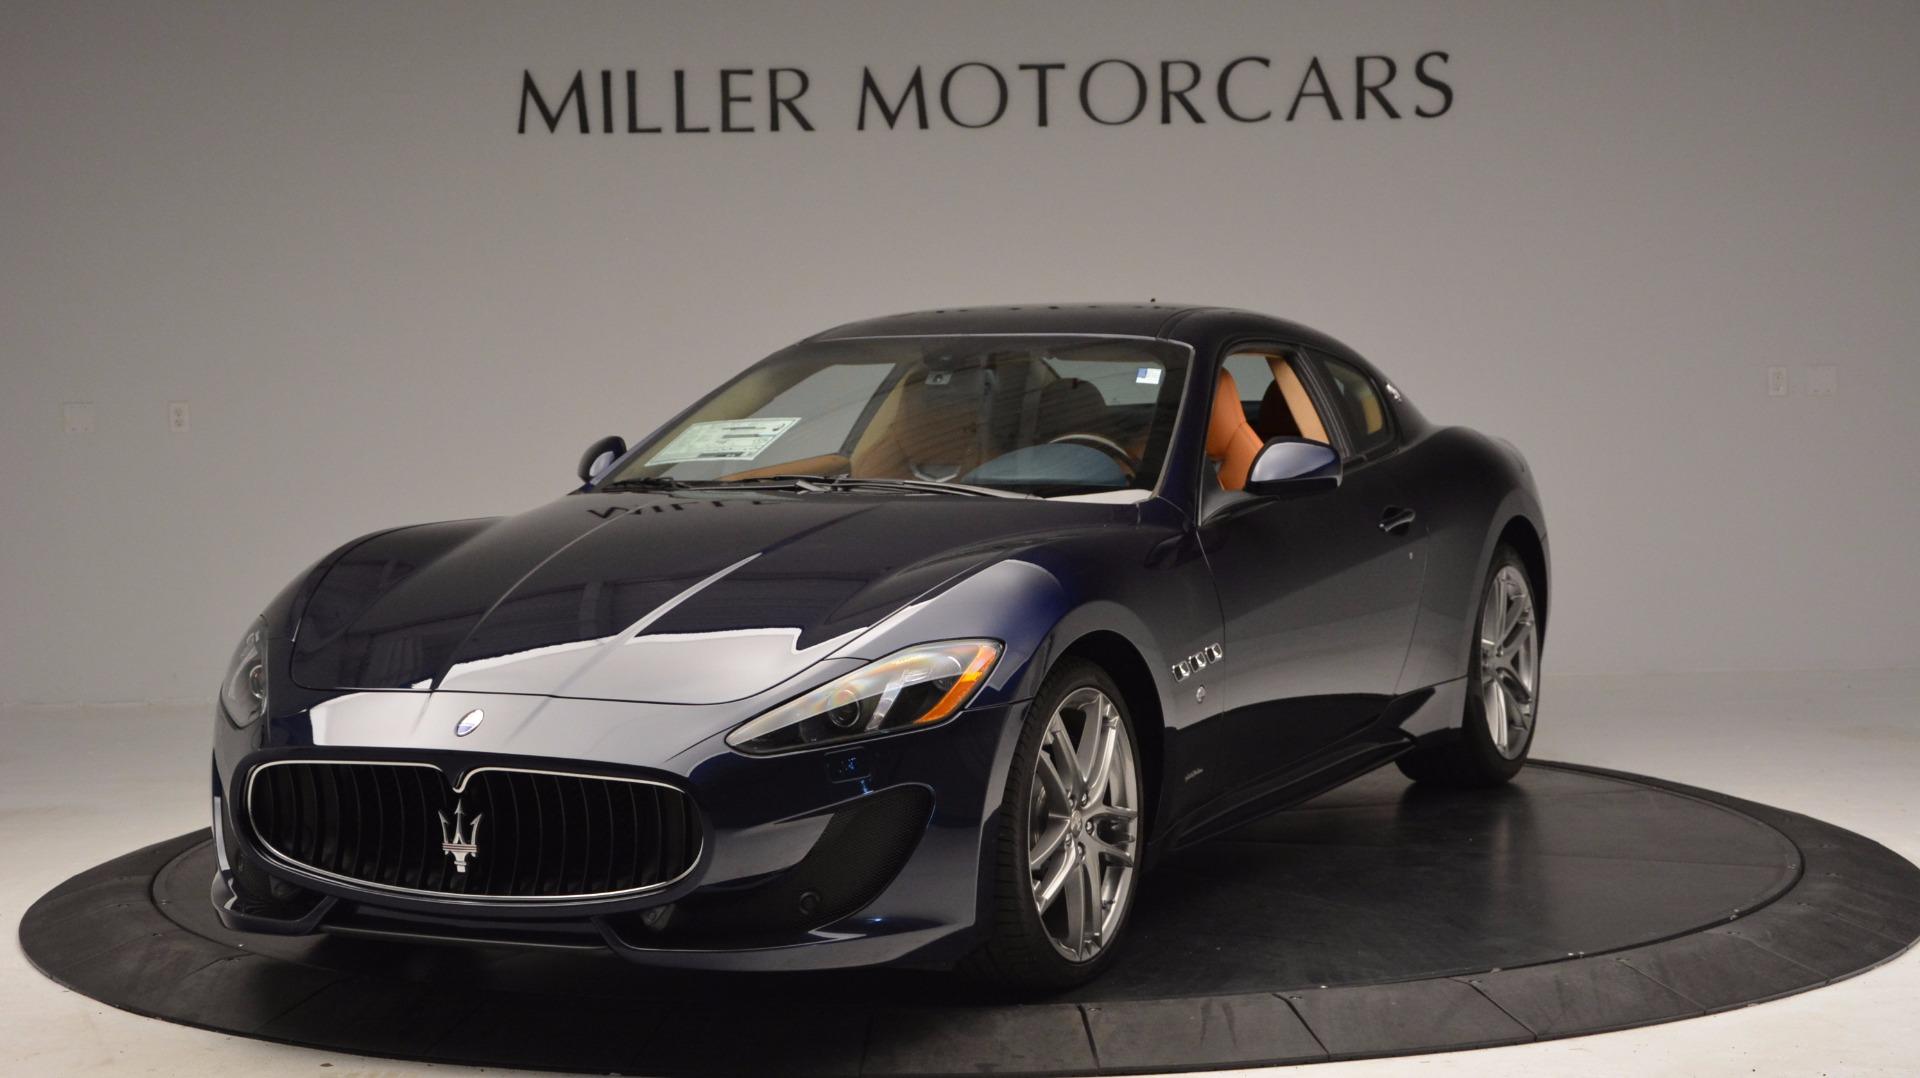 New 2017 Maserati GranTurismo Coupe Sport For Sale In Westport, CT 1295_main